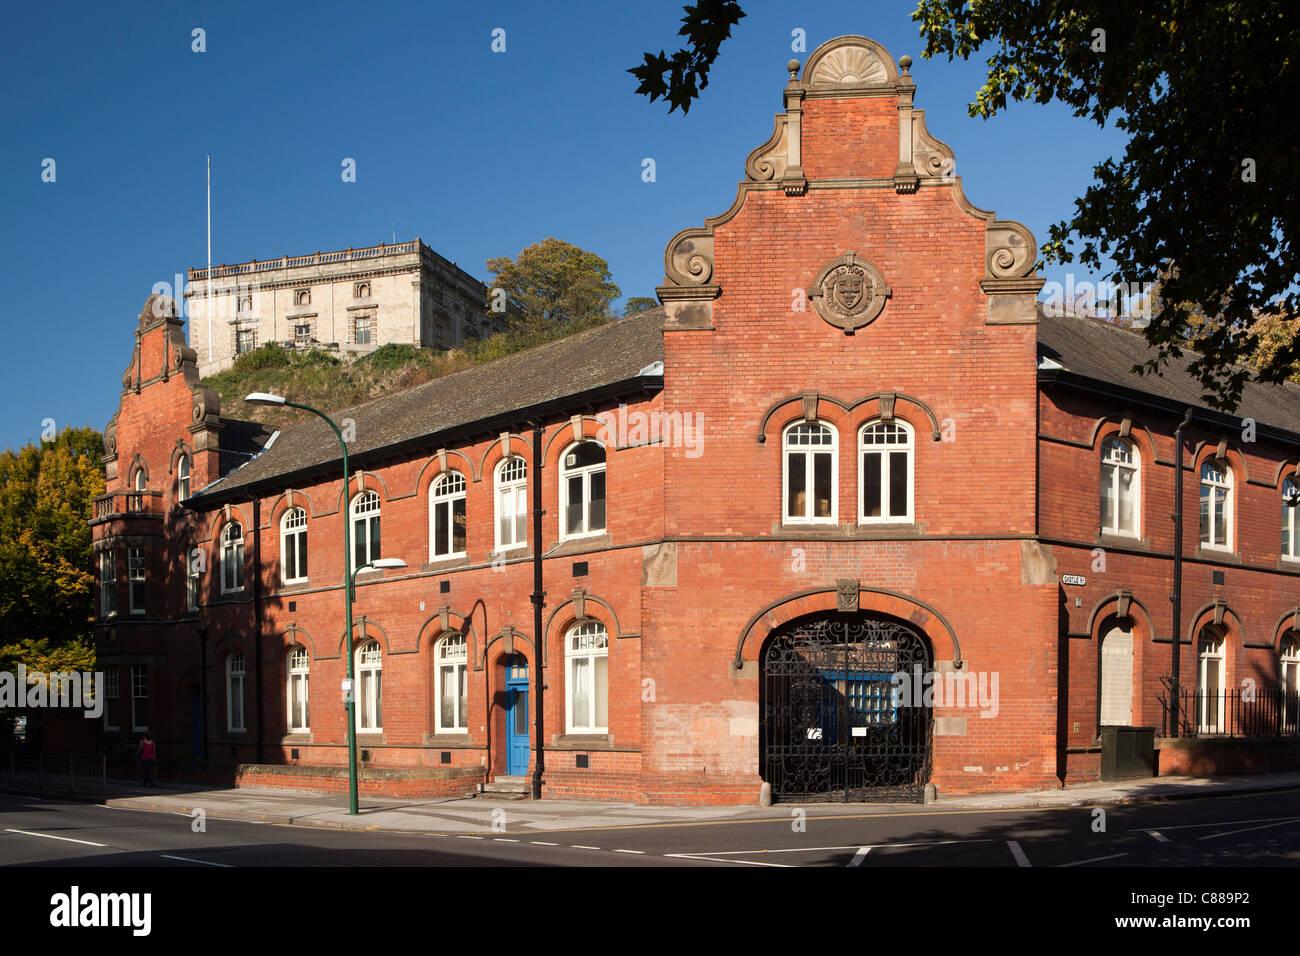 UK, Nottinghamshire, Nottingham, Castle Boulevard, old Corporation Water Works building below the castle - Stock Image